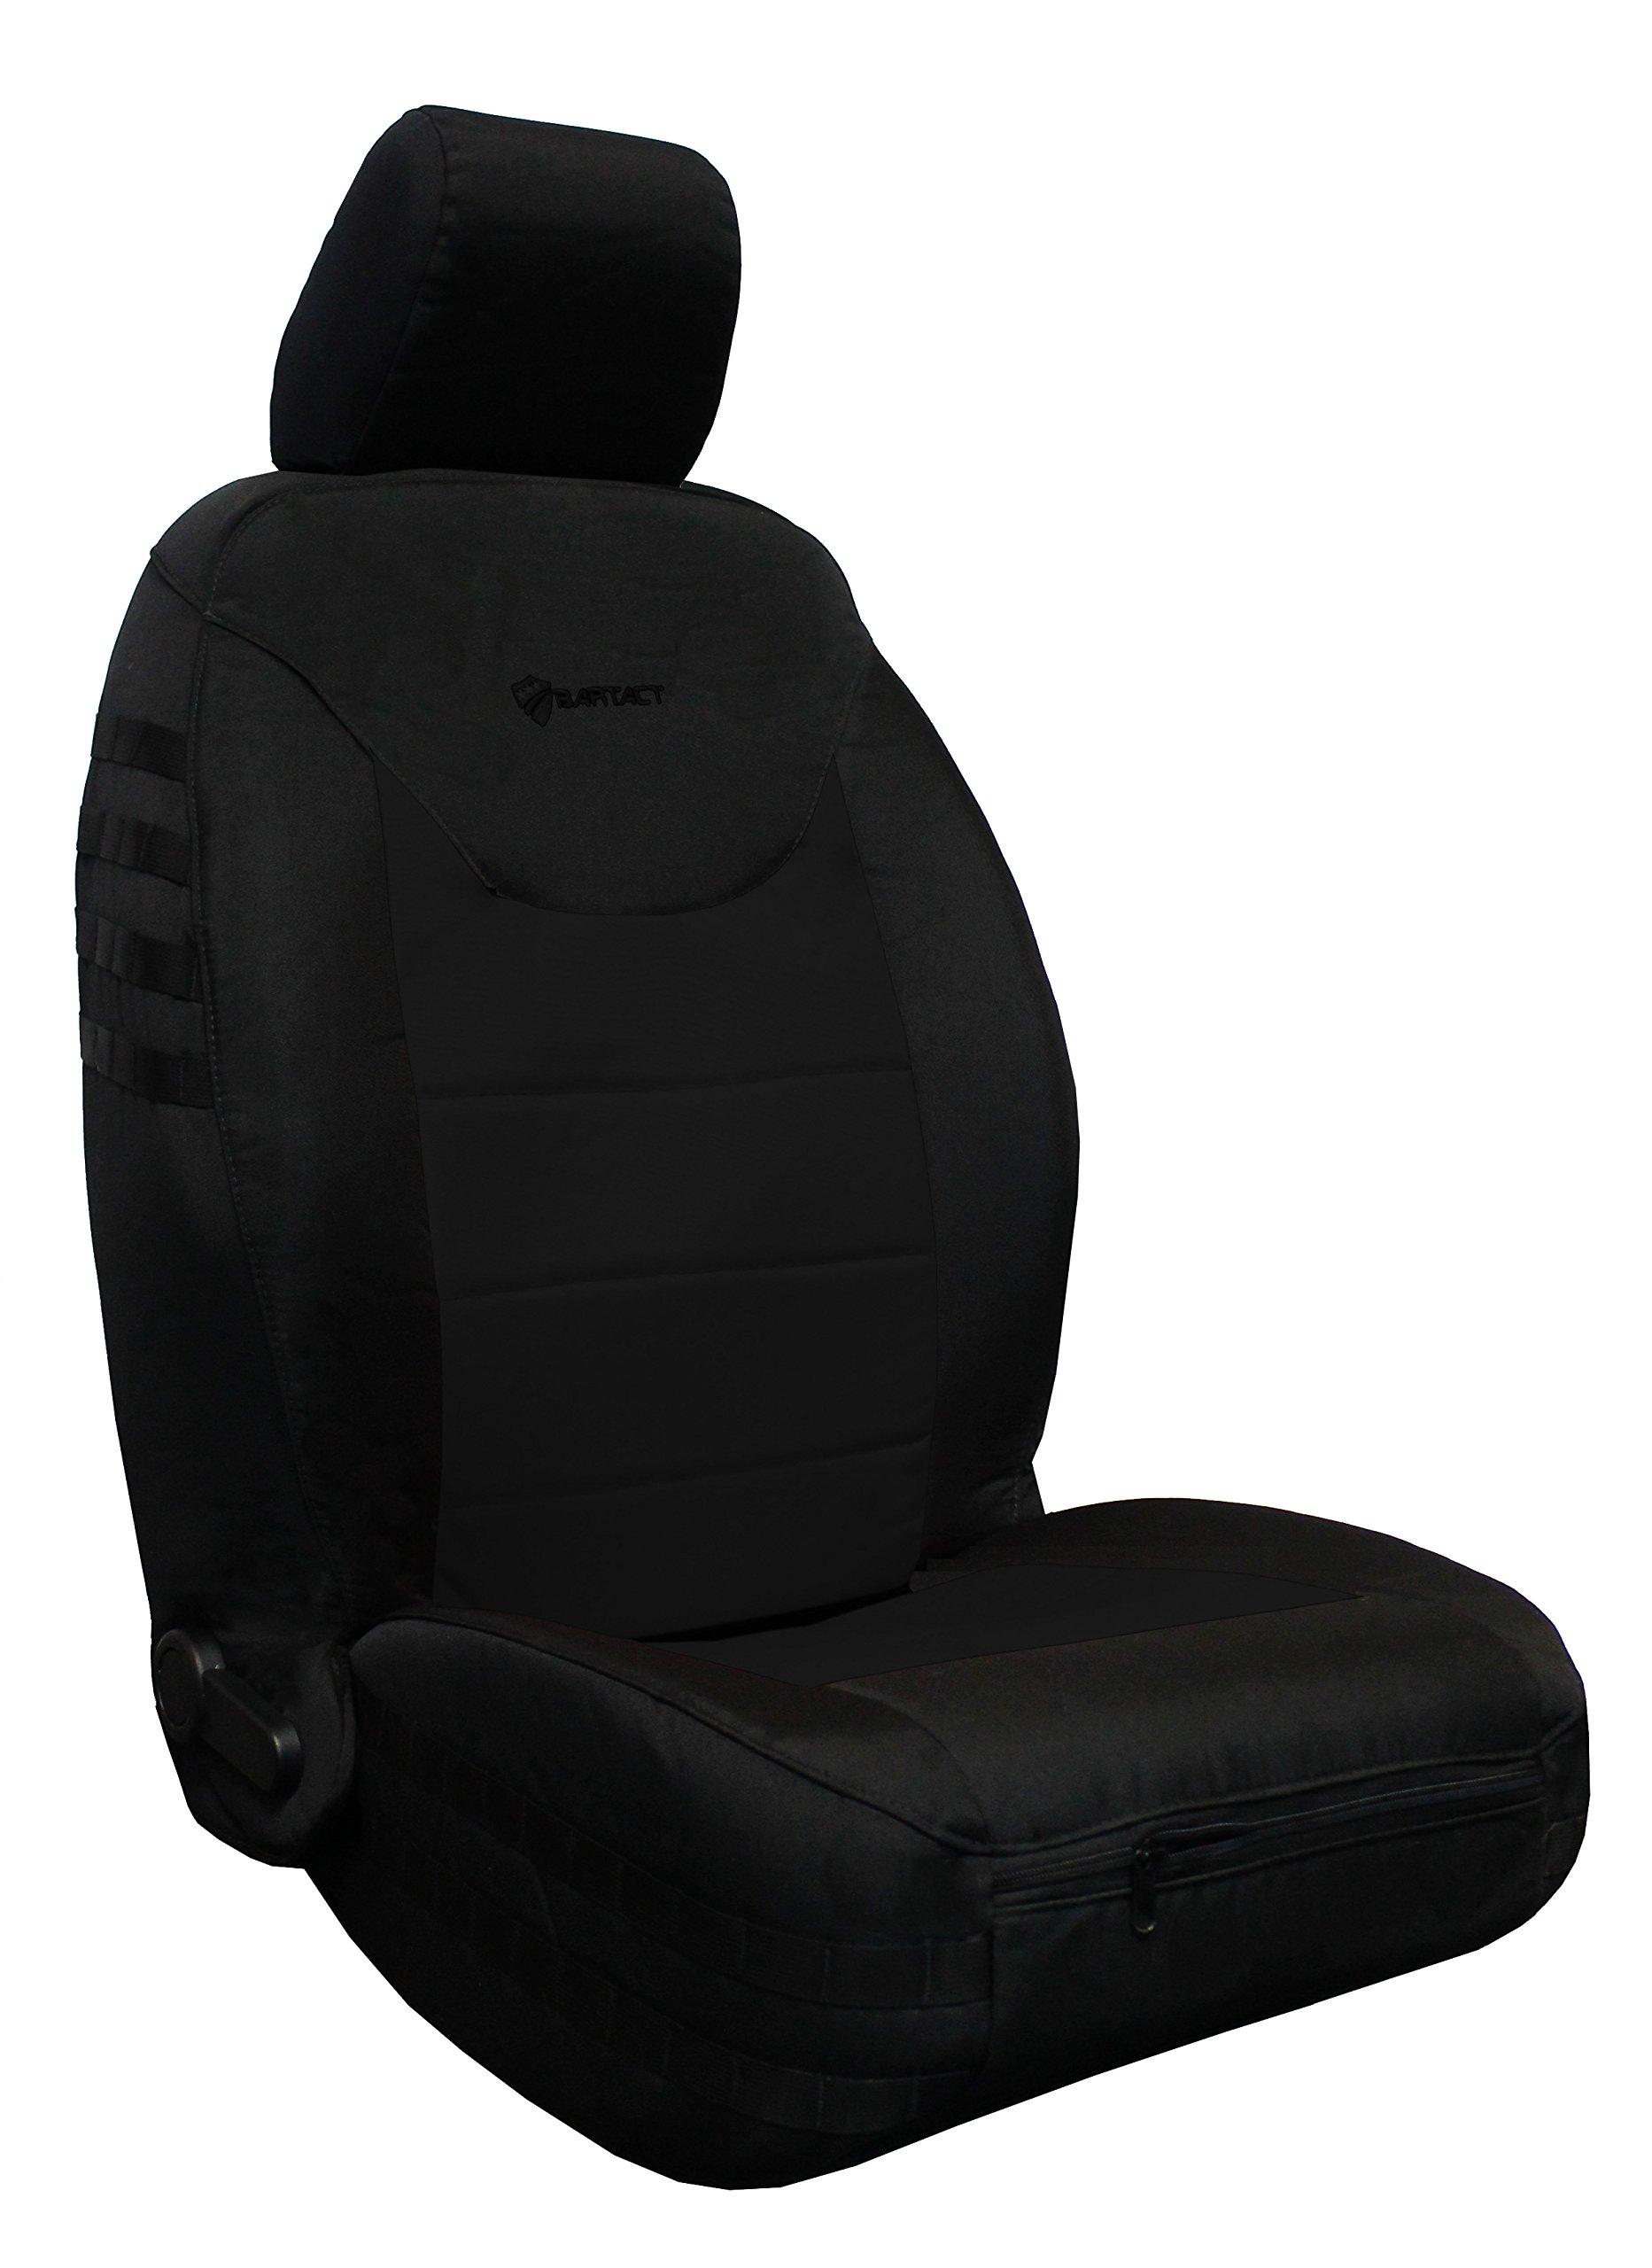 Bartact 2013-17 Front Seat Covers (Pair) Jeep Wrangler JK and JKU - AIR Bag Compatible (Black/Black)